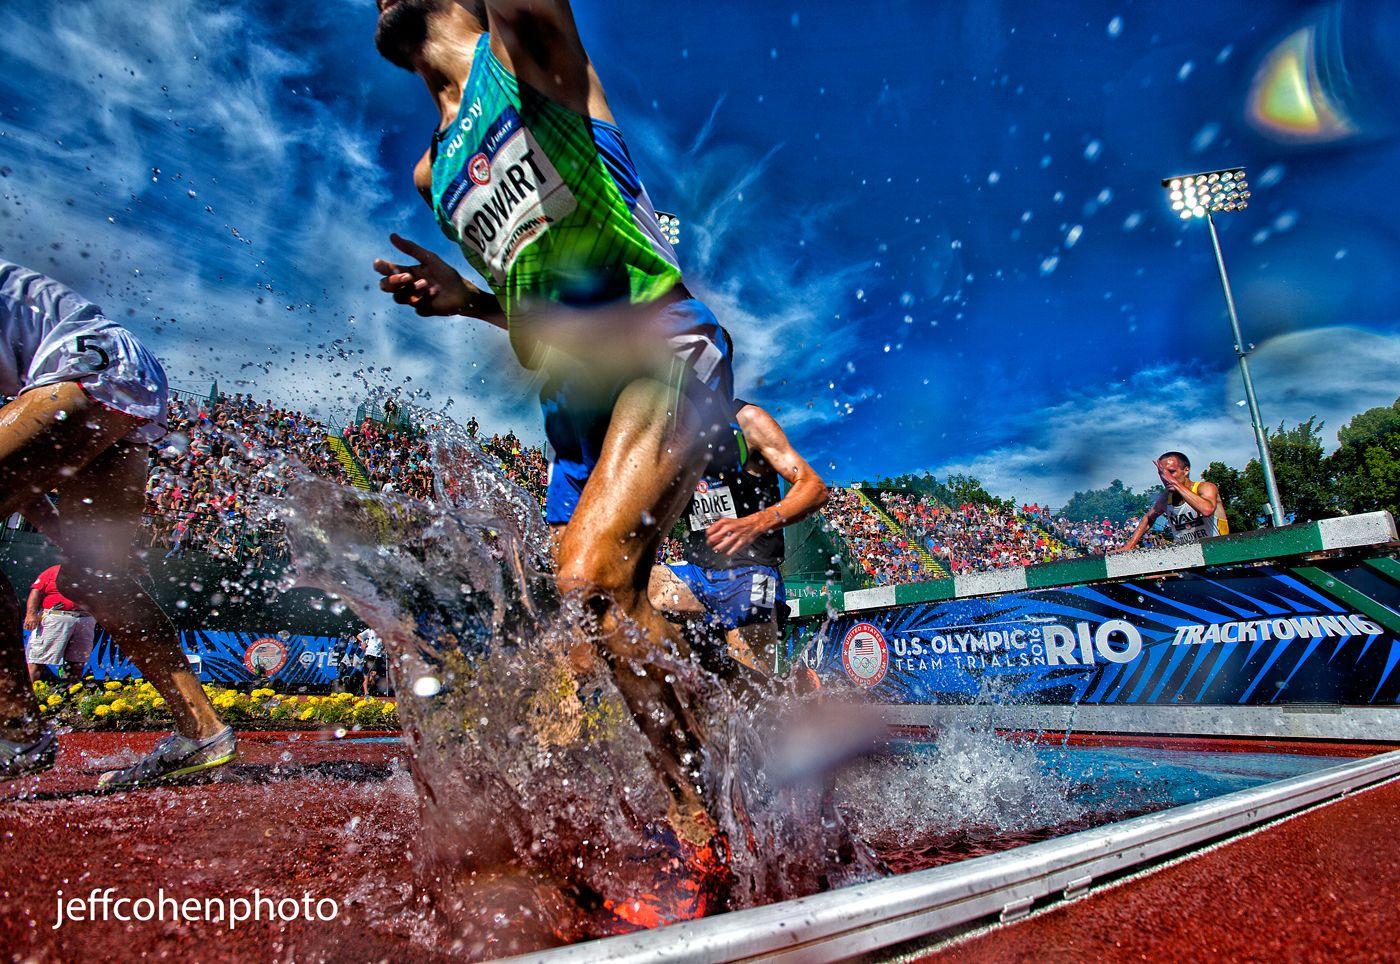 1r2016_oly_trials_day_4_steeple_splash_jeff_cohen_photo_17524_web.jpg